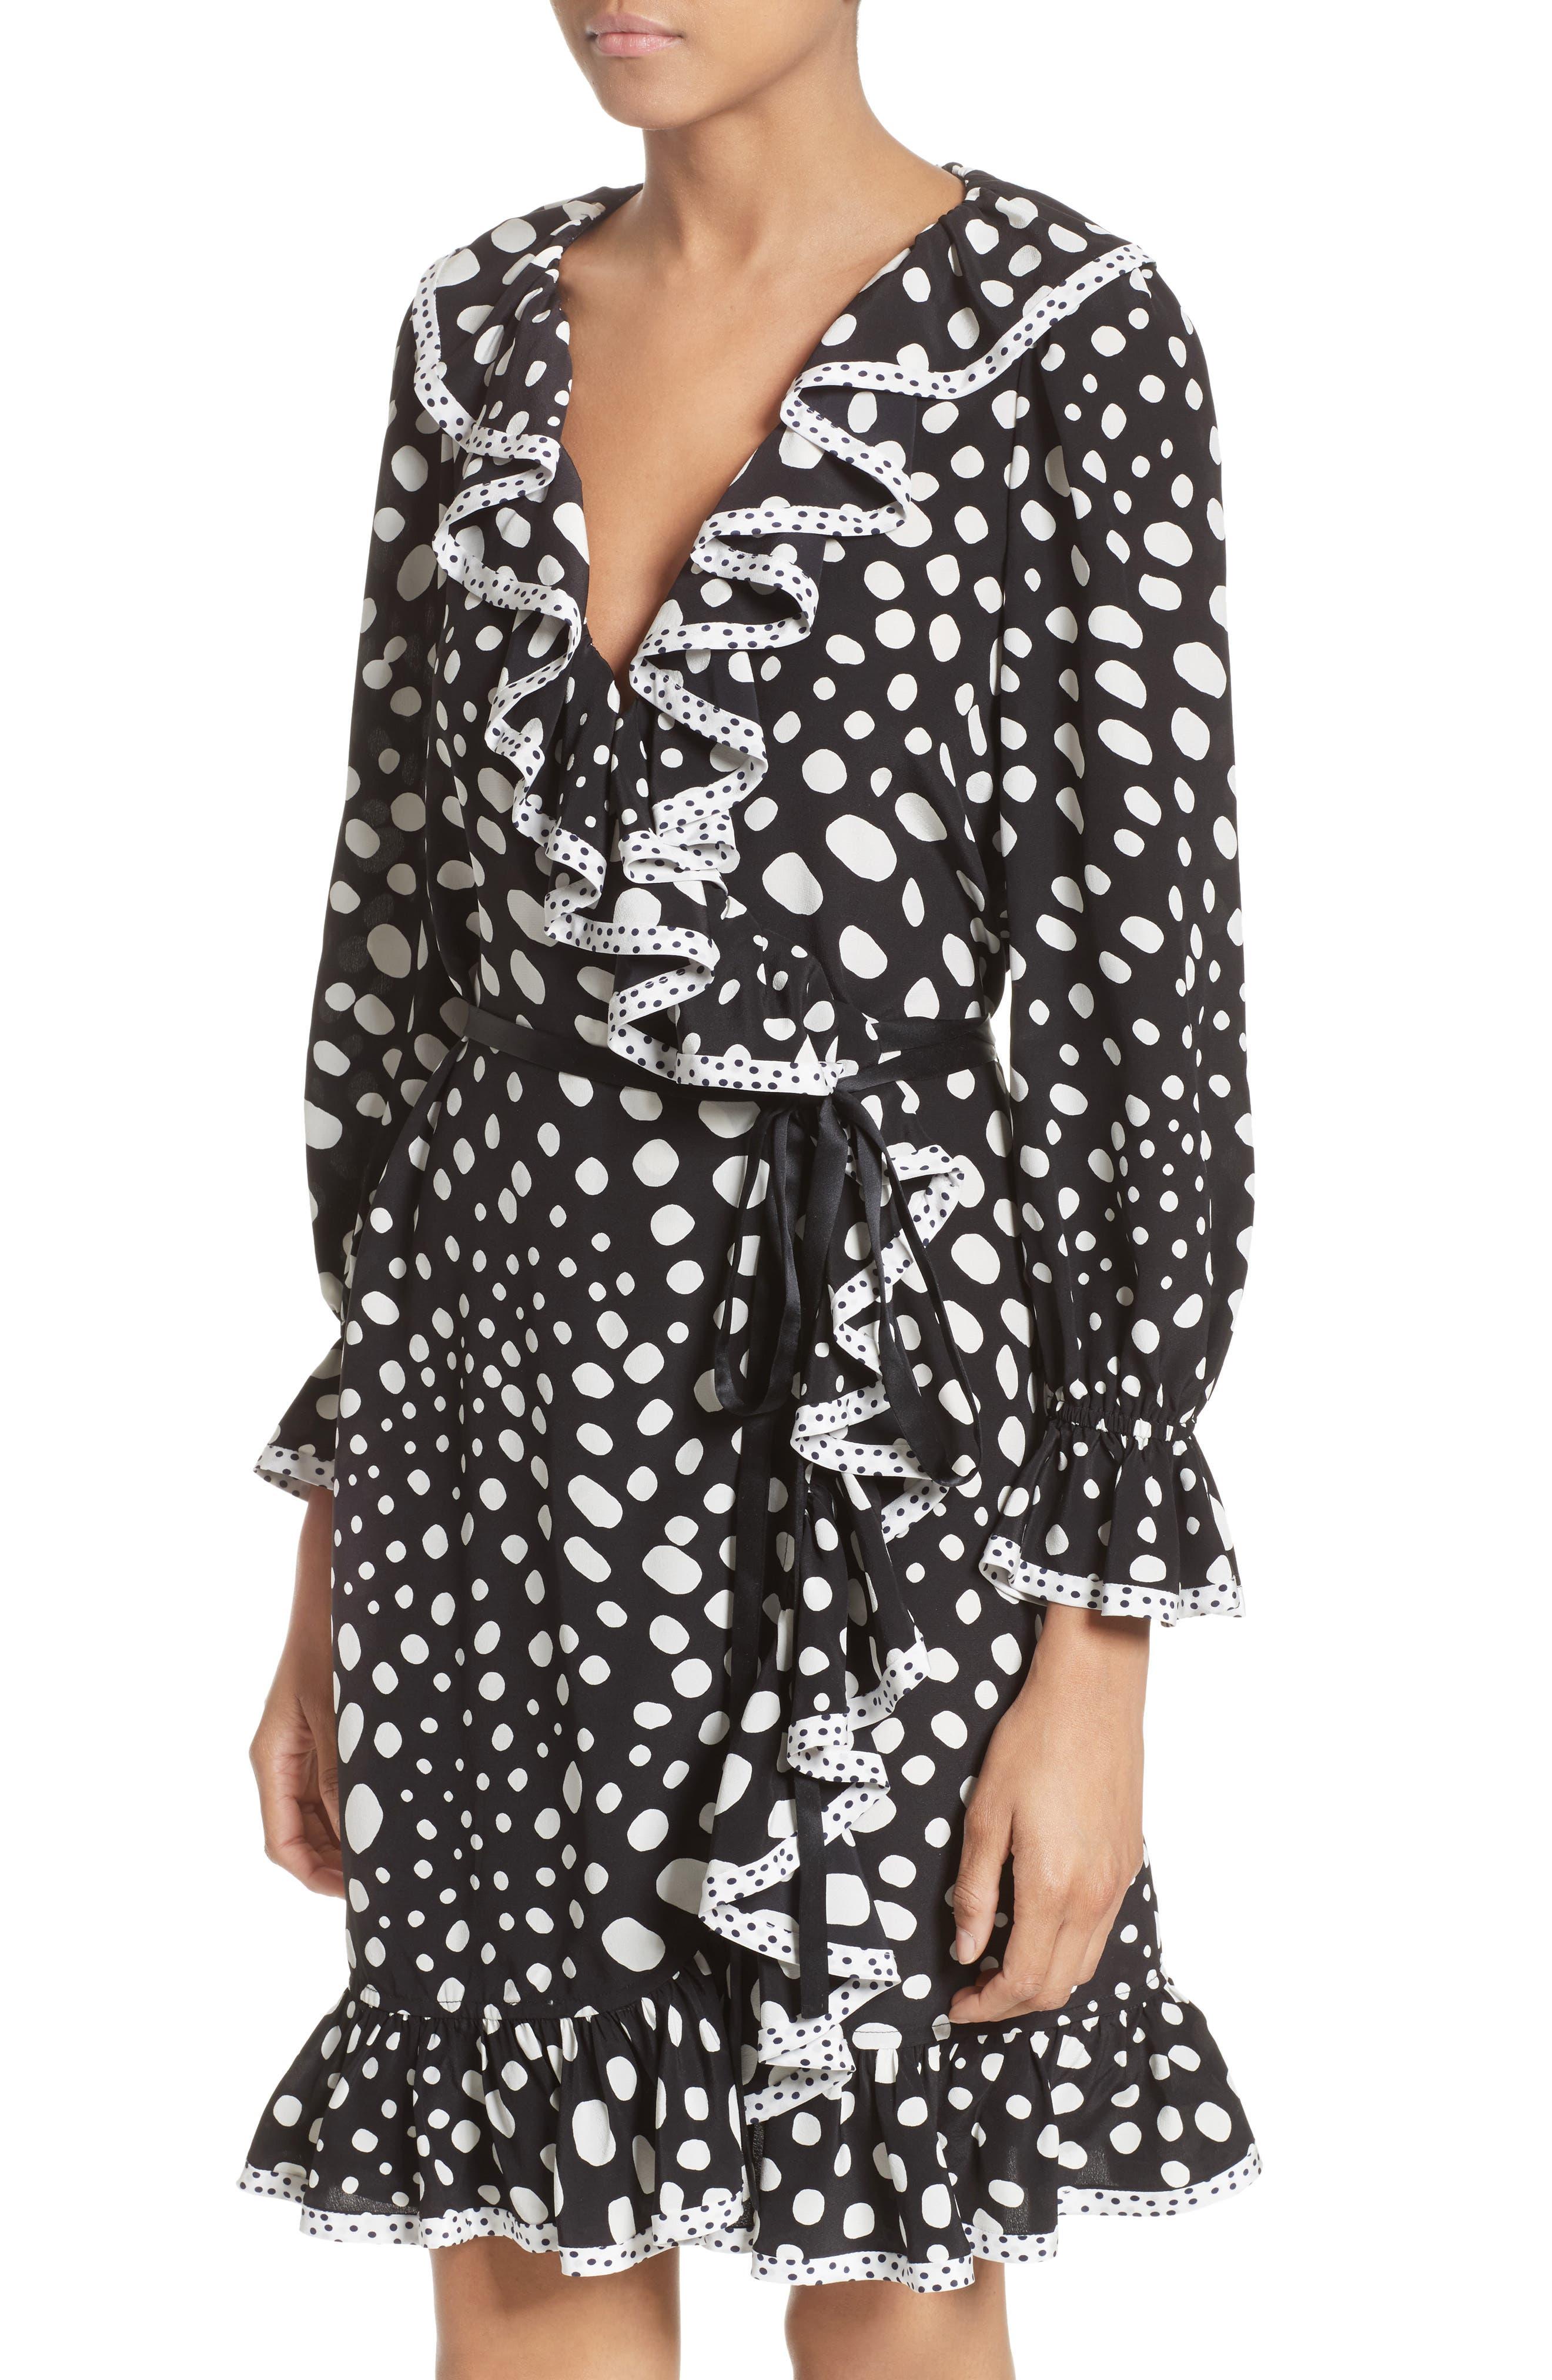 Polka Dot Ruffle Silk Wrap Dress,                             Alternate thumbnail 9, color,                             Black/ White